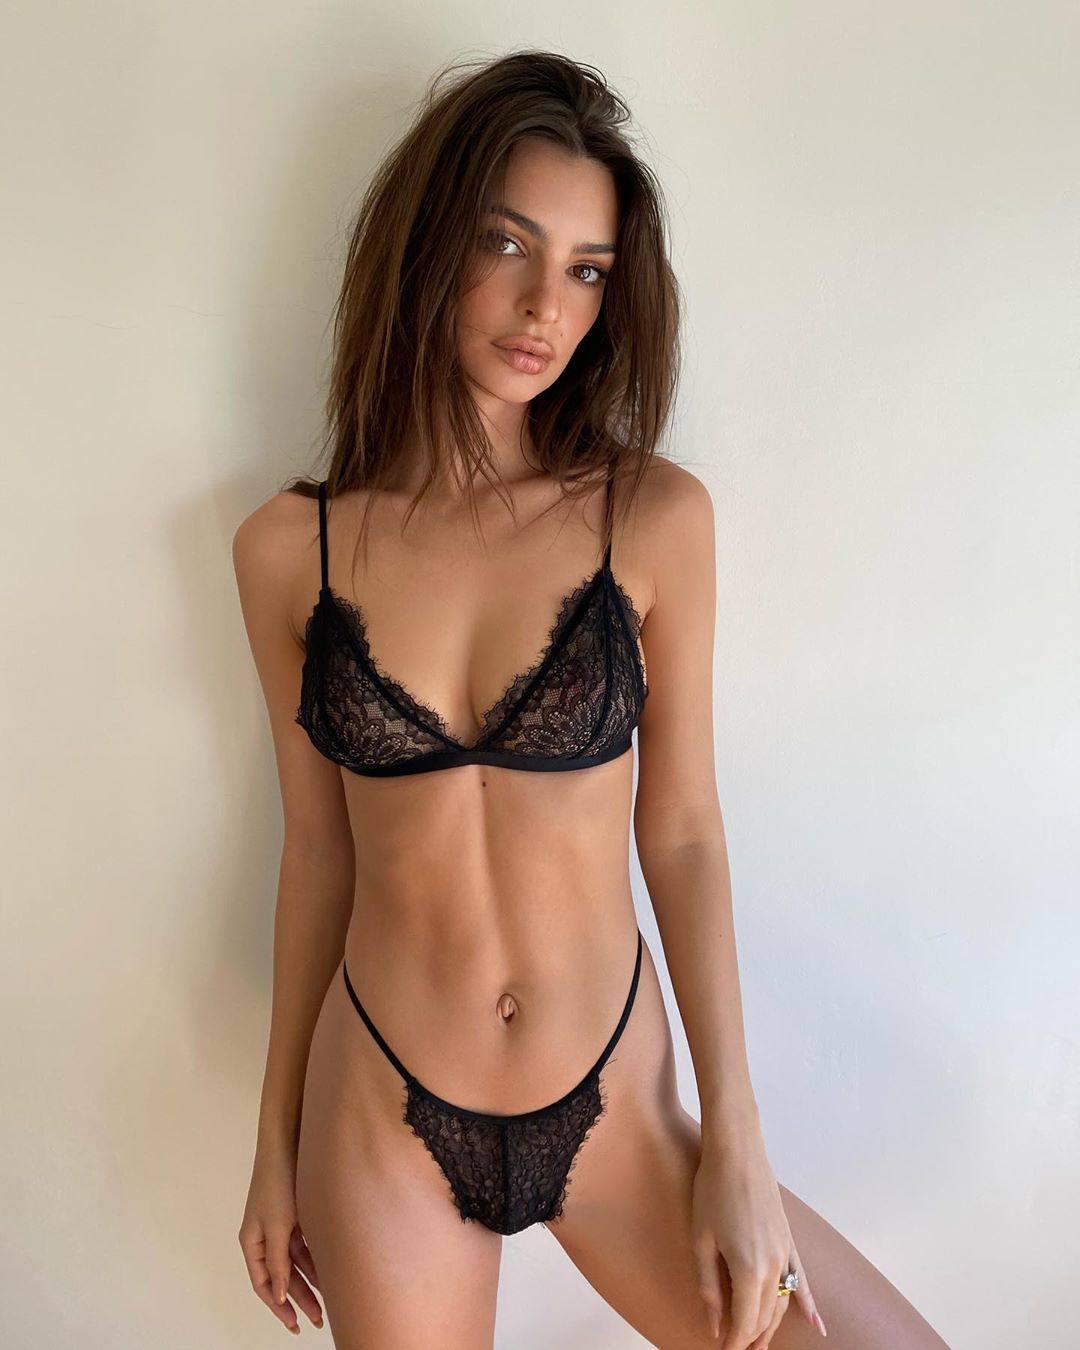 Emily Ratajkowski Perfect Body In Tiny Black Lingerie 0001